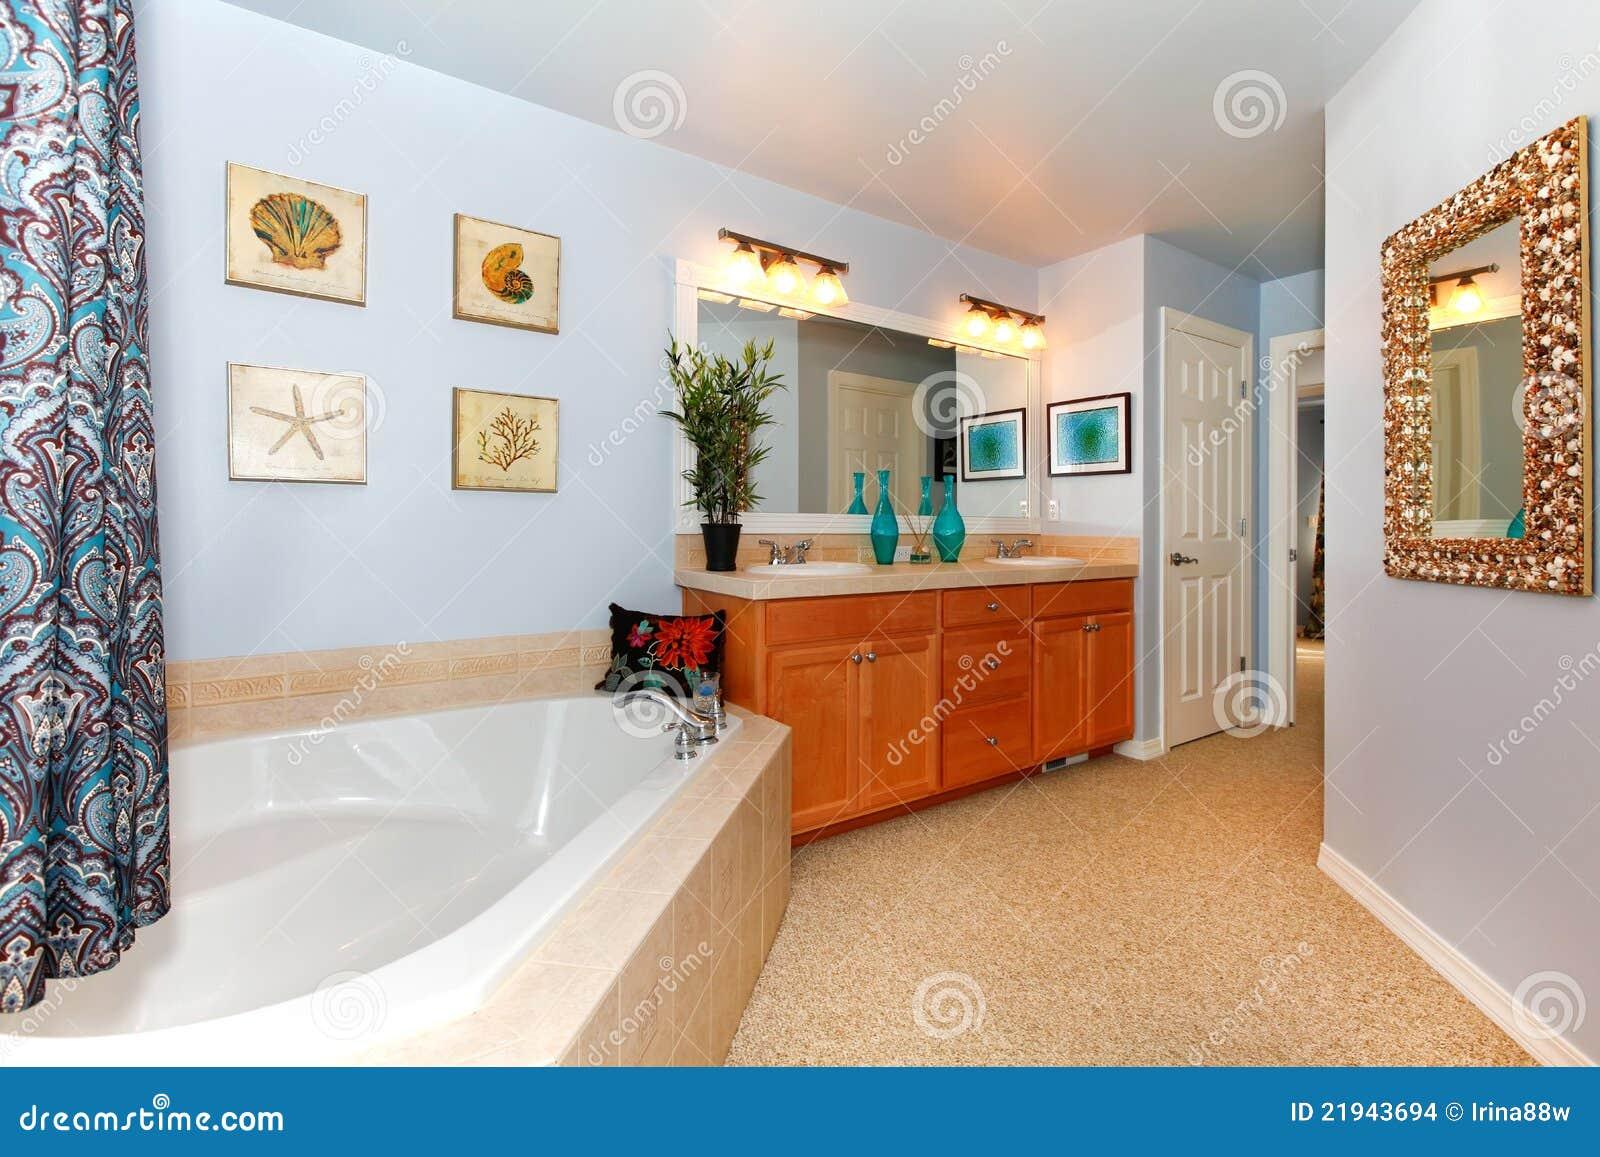 Blue Bathroom With Large Triangle Tub Stock Photo - Image of bath ...